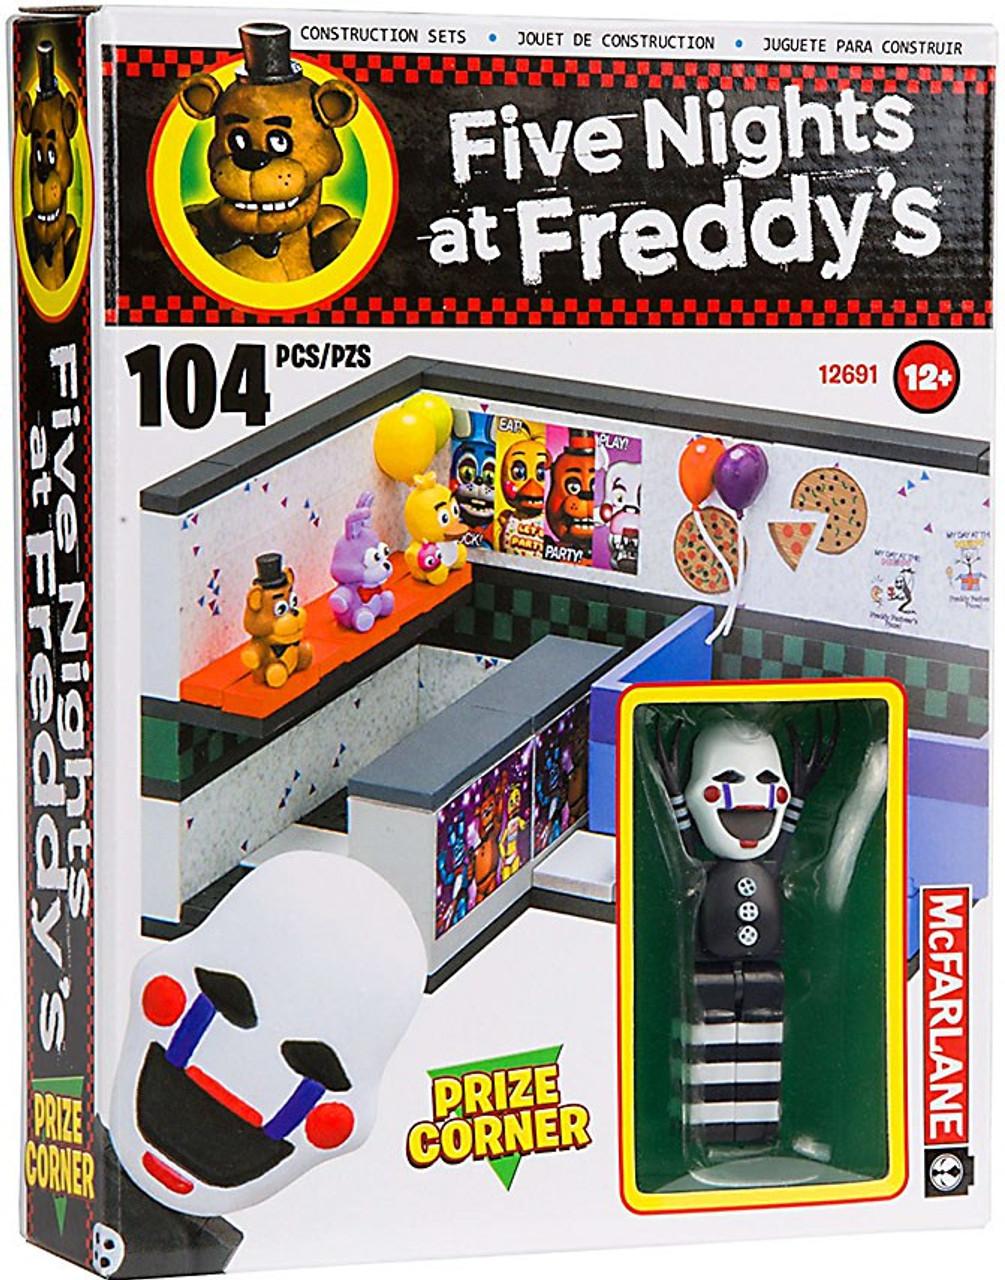 Mcfarlane Toys Five Nights At Freddys Prize Corner